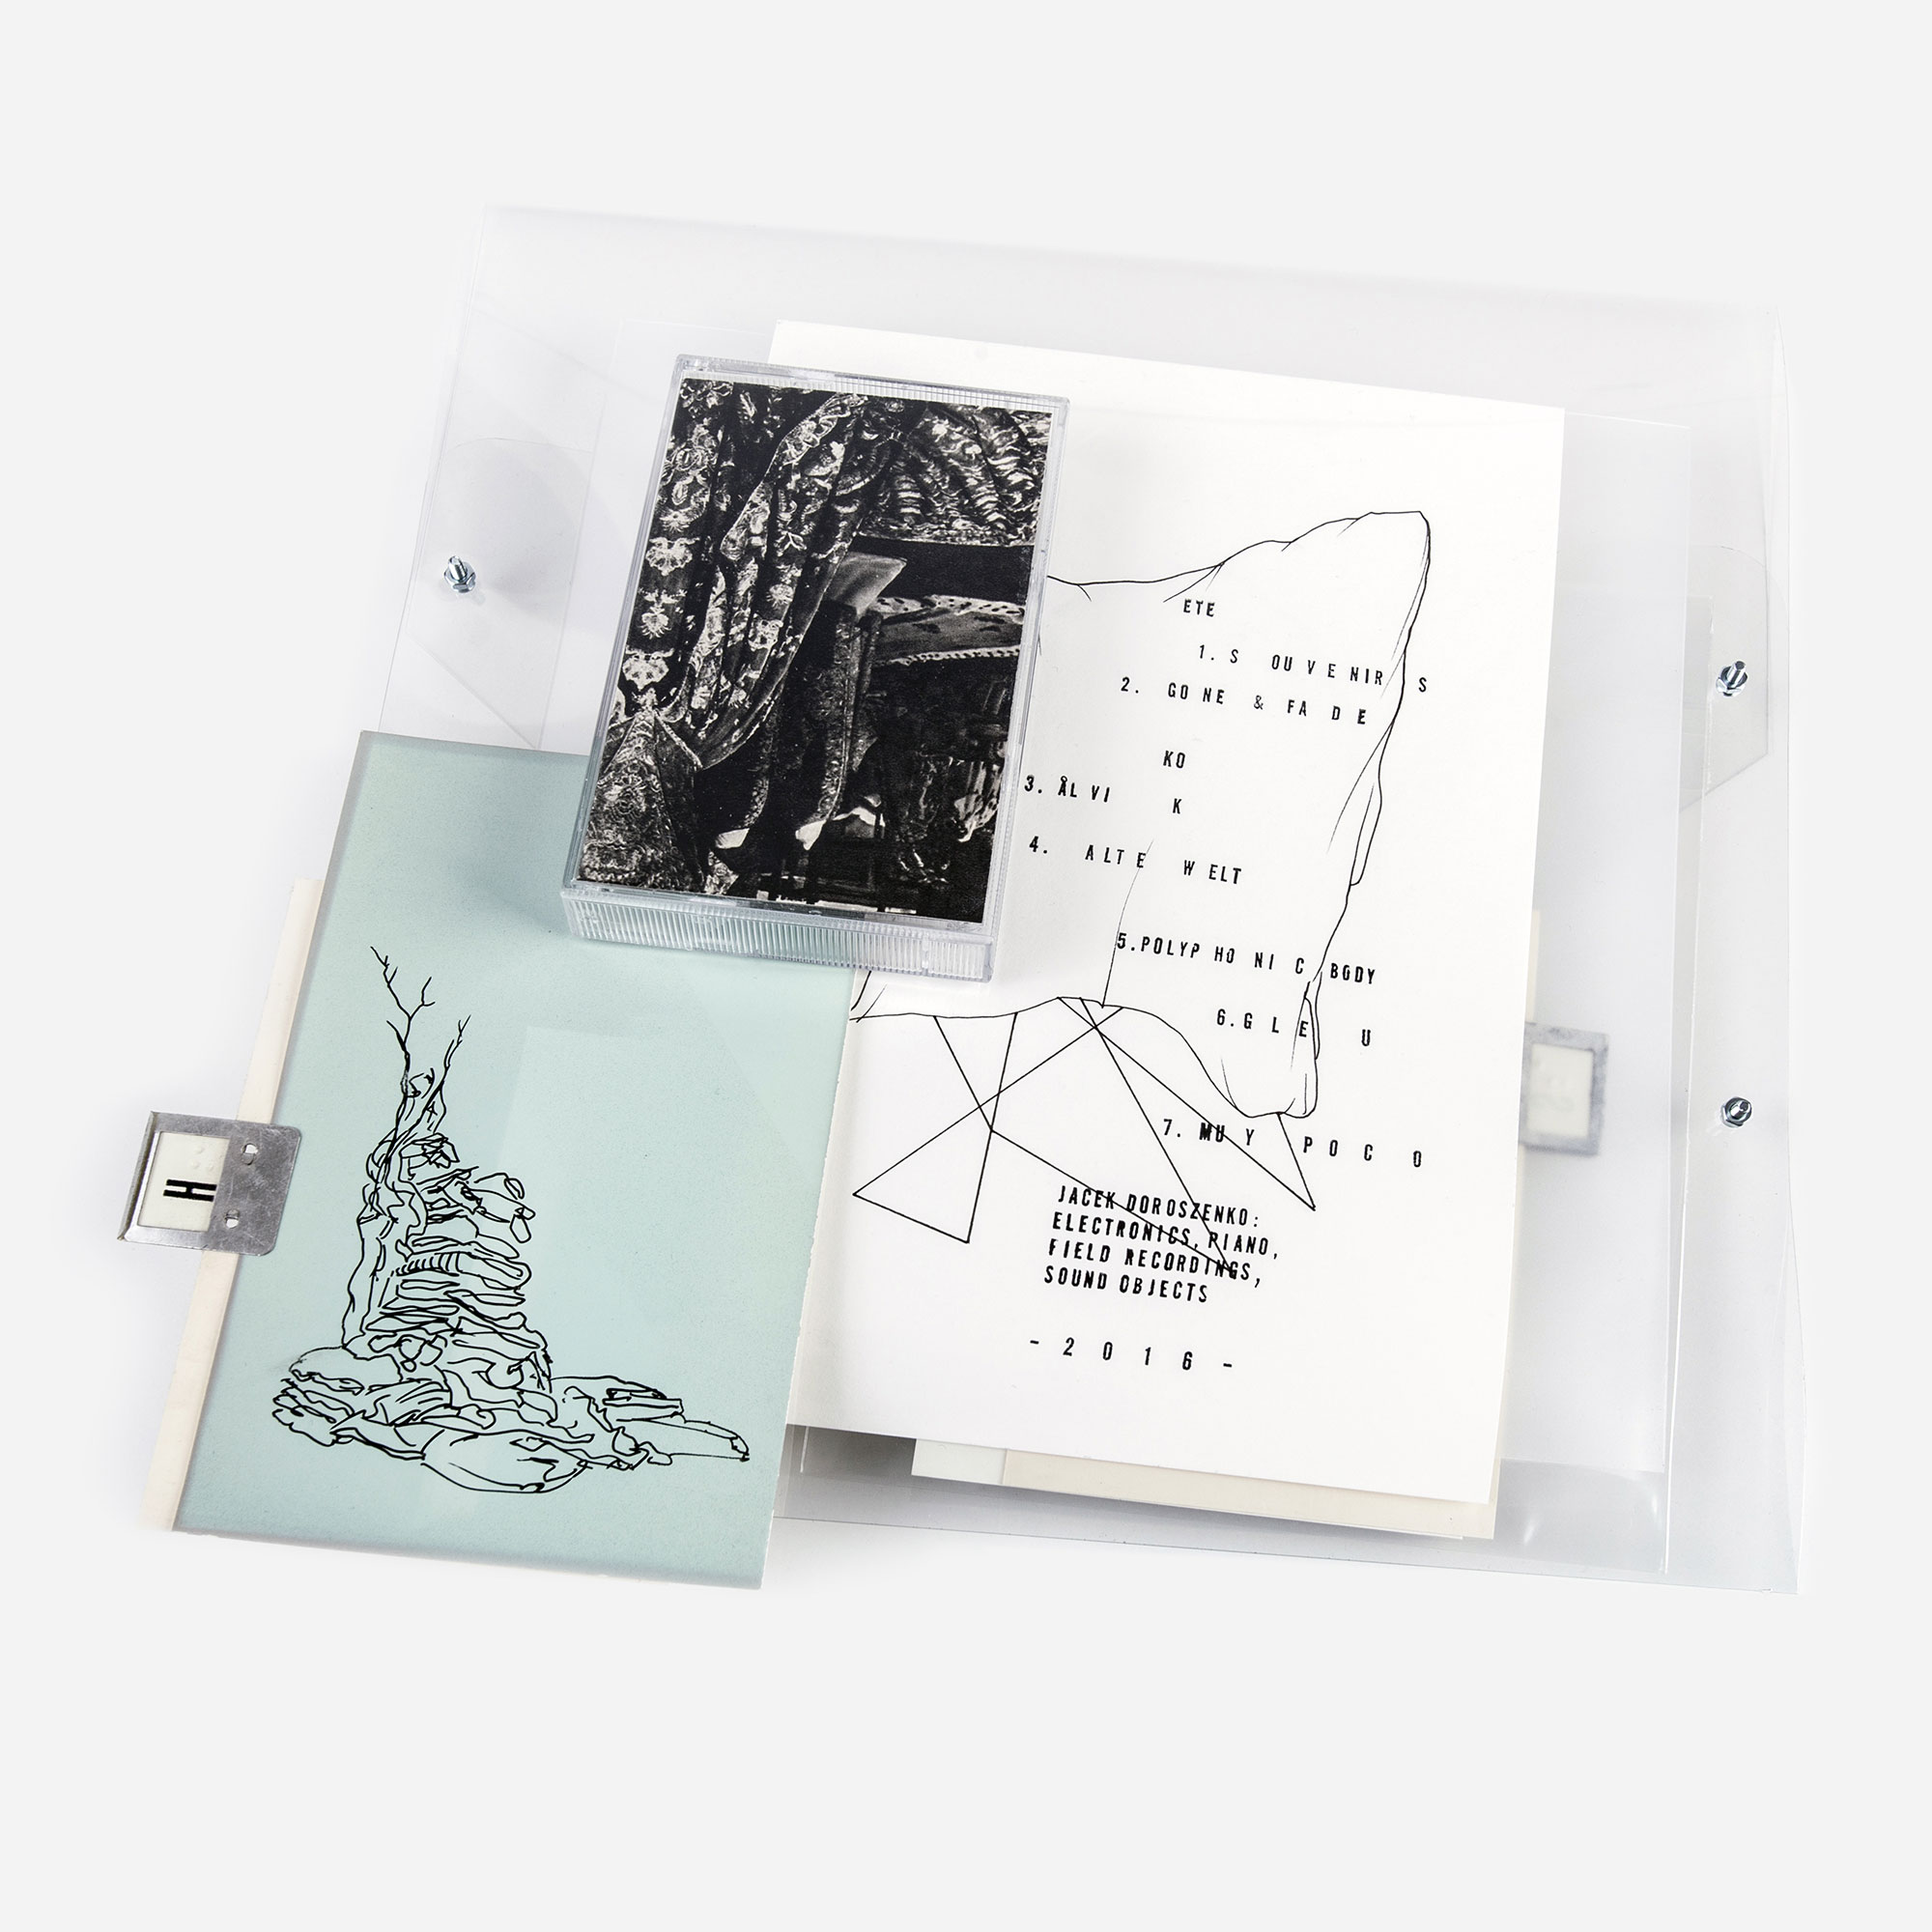 Jacek Doroszenko - Useful Remnants, music album 06